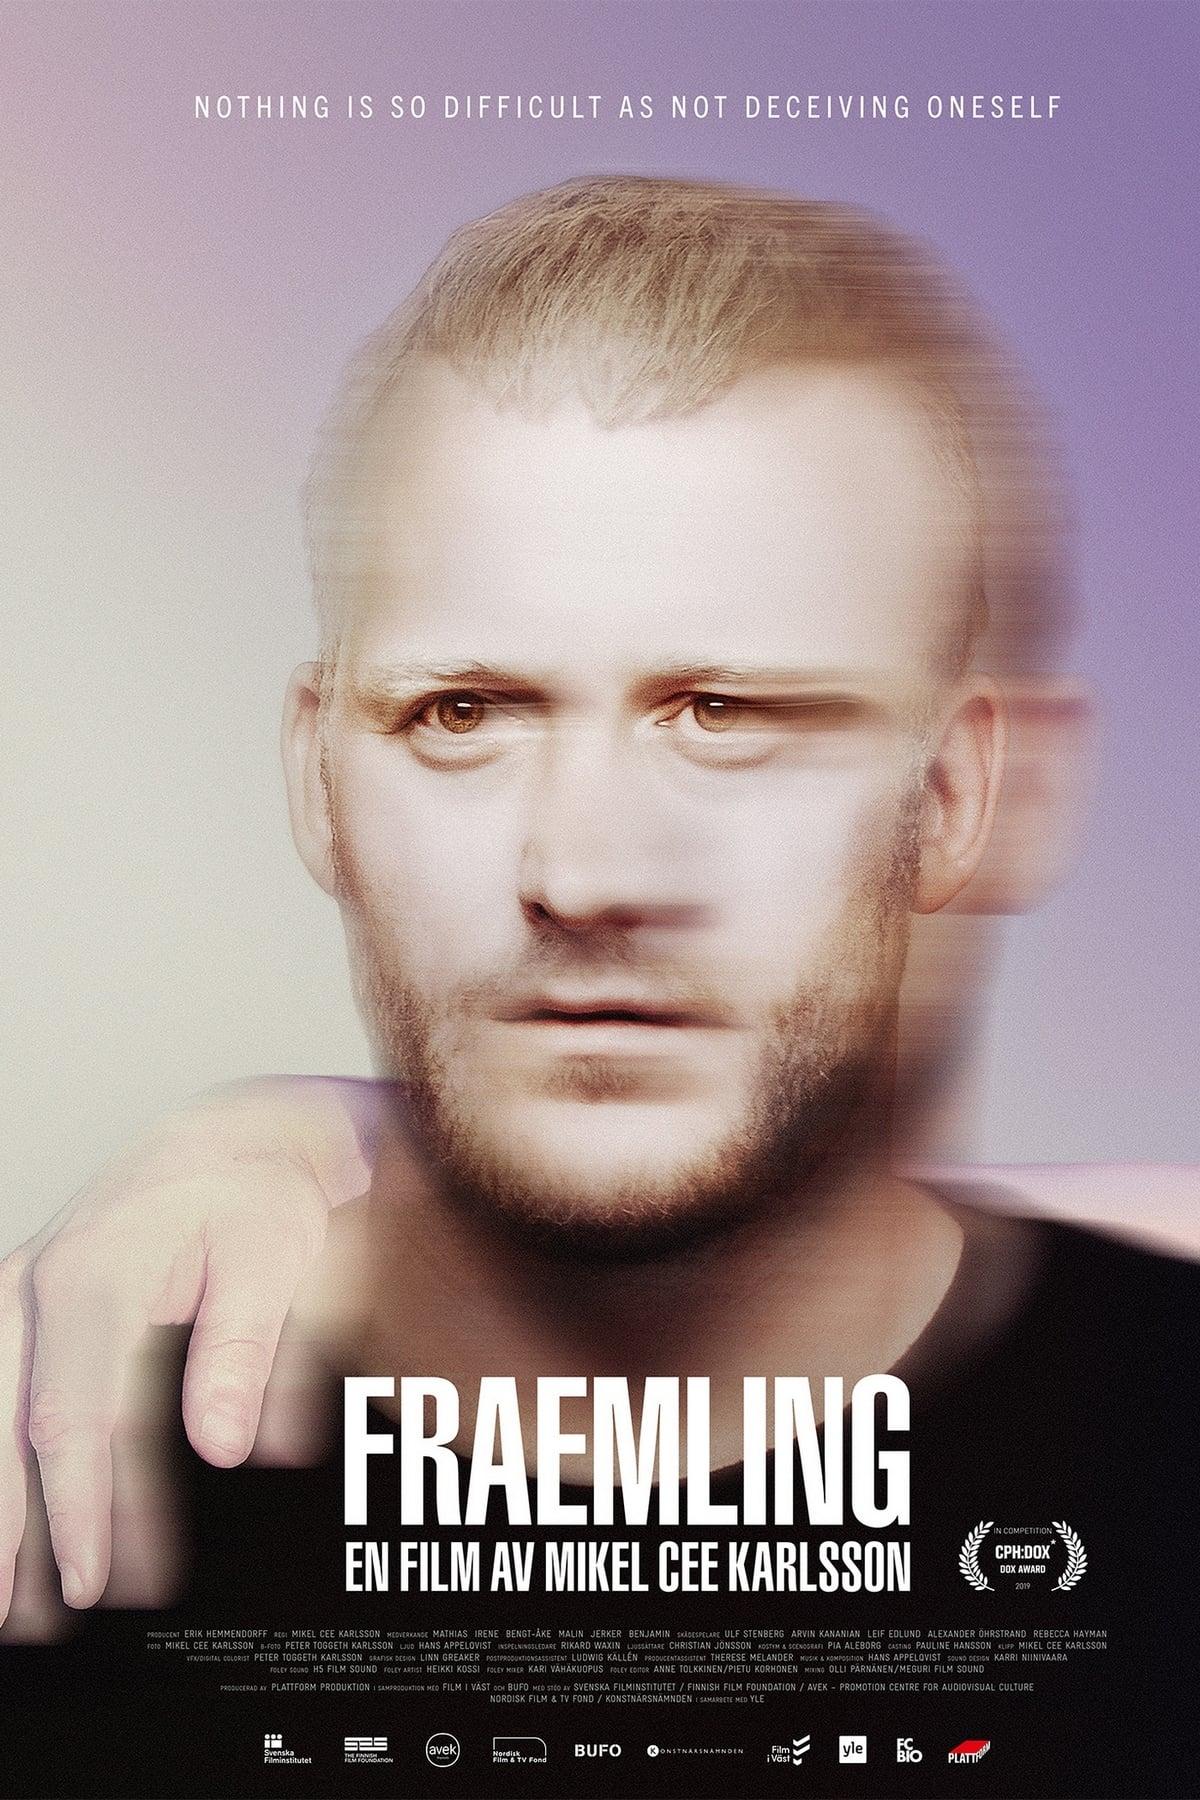 Fraemling